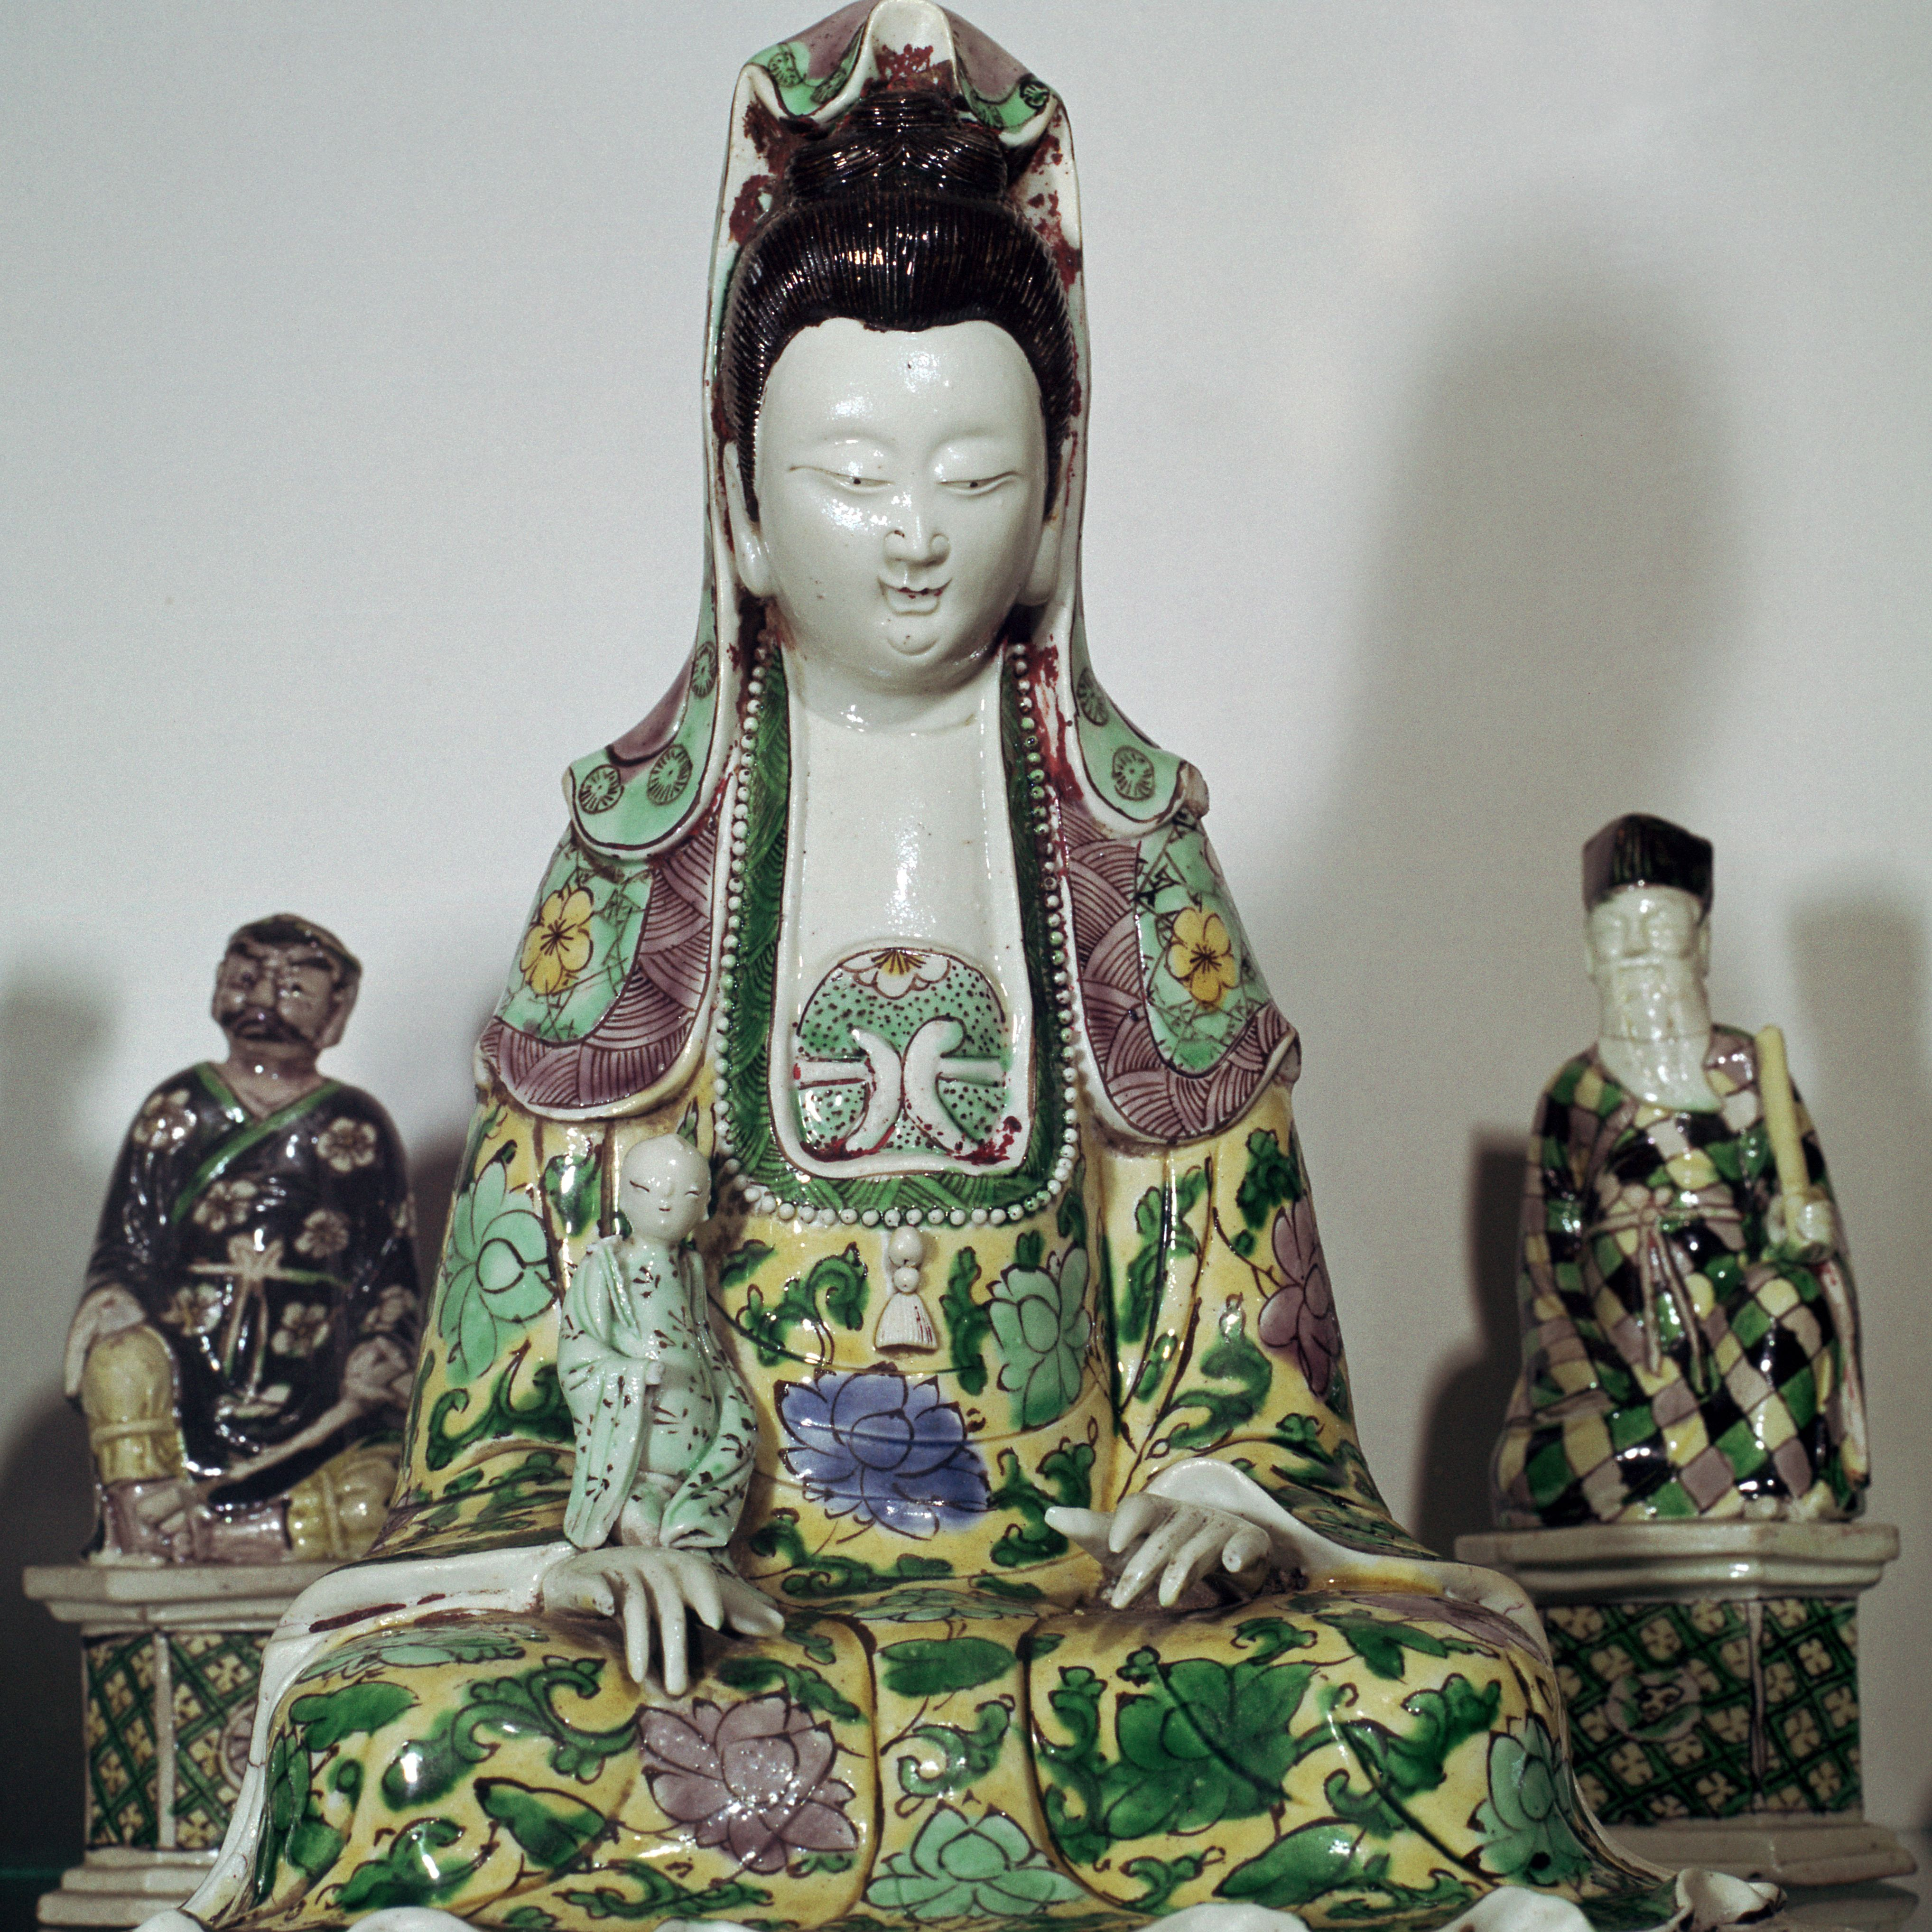 statuette of Kuan-Yin, the Taoist goddess of mercy.